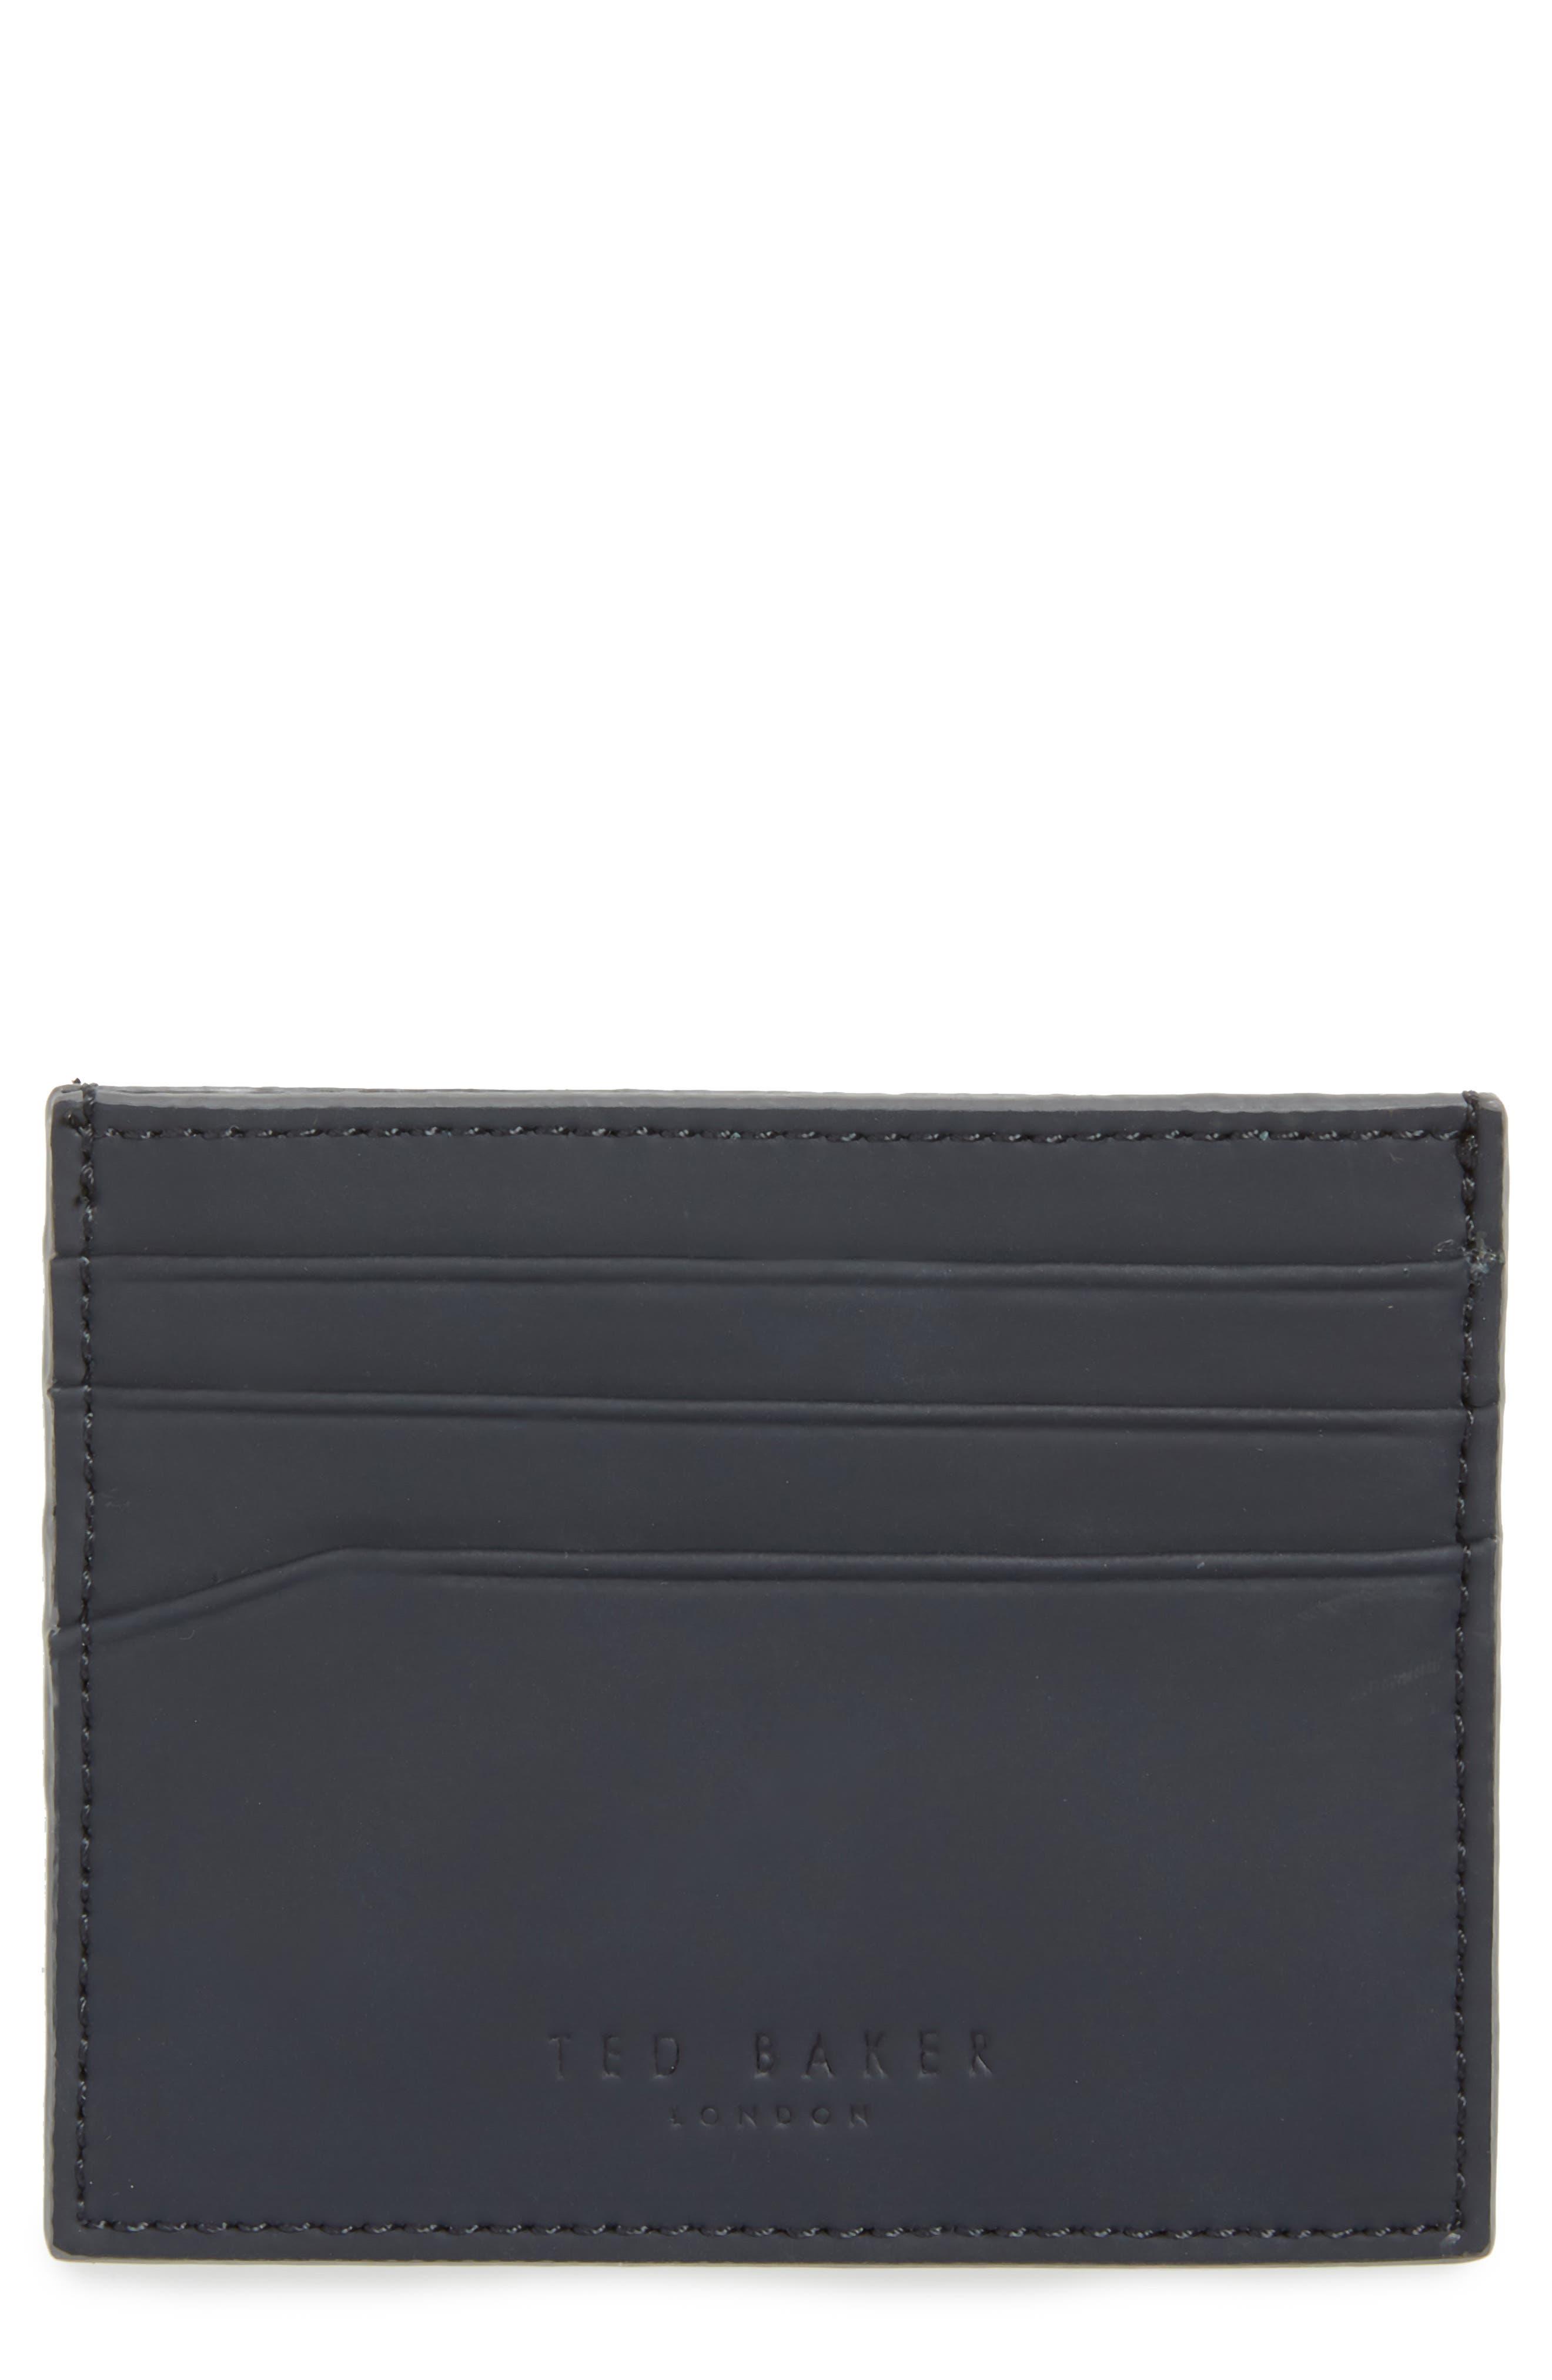 Sands Rubber Leather Card Case,                             Main thumbnail 1, color,                             410